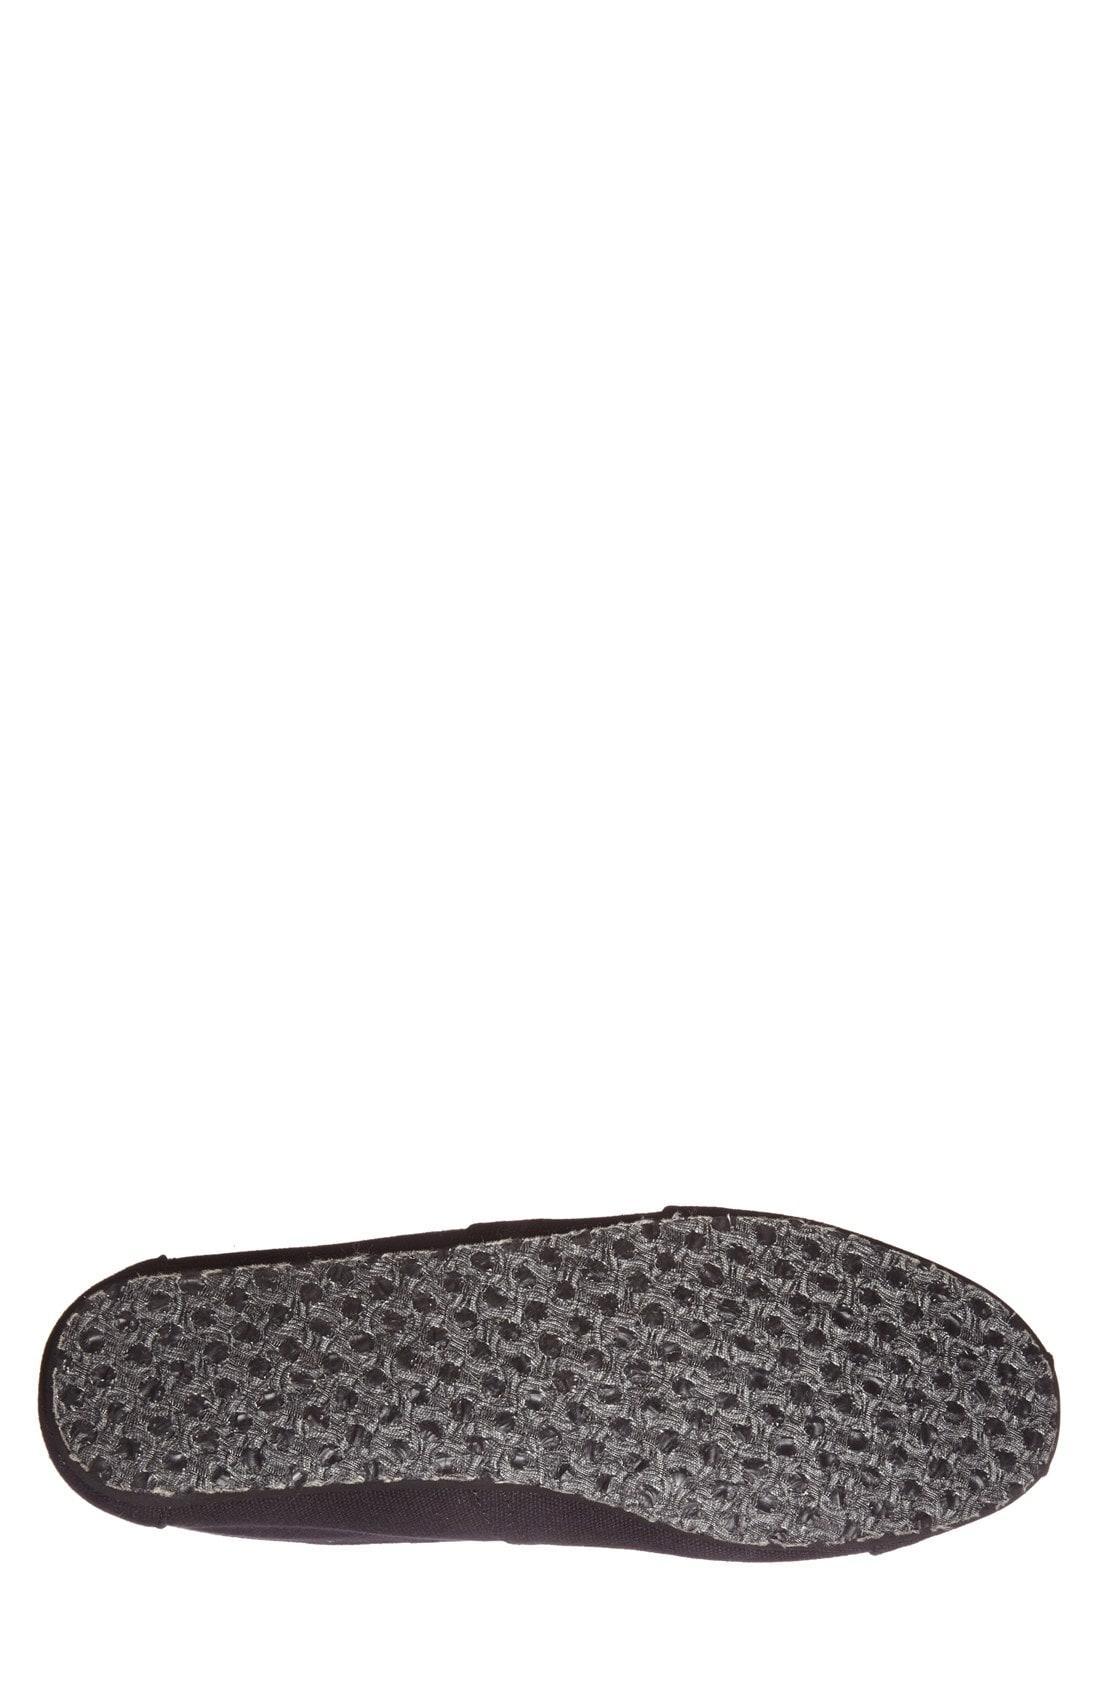 Toms Men's Alpargata Slip-Ons Men's Shoes In Black